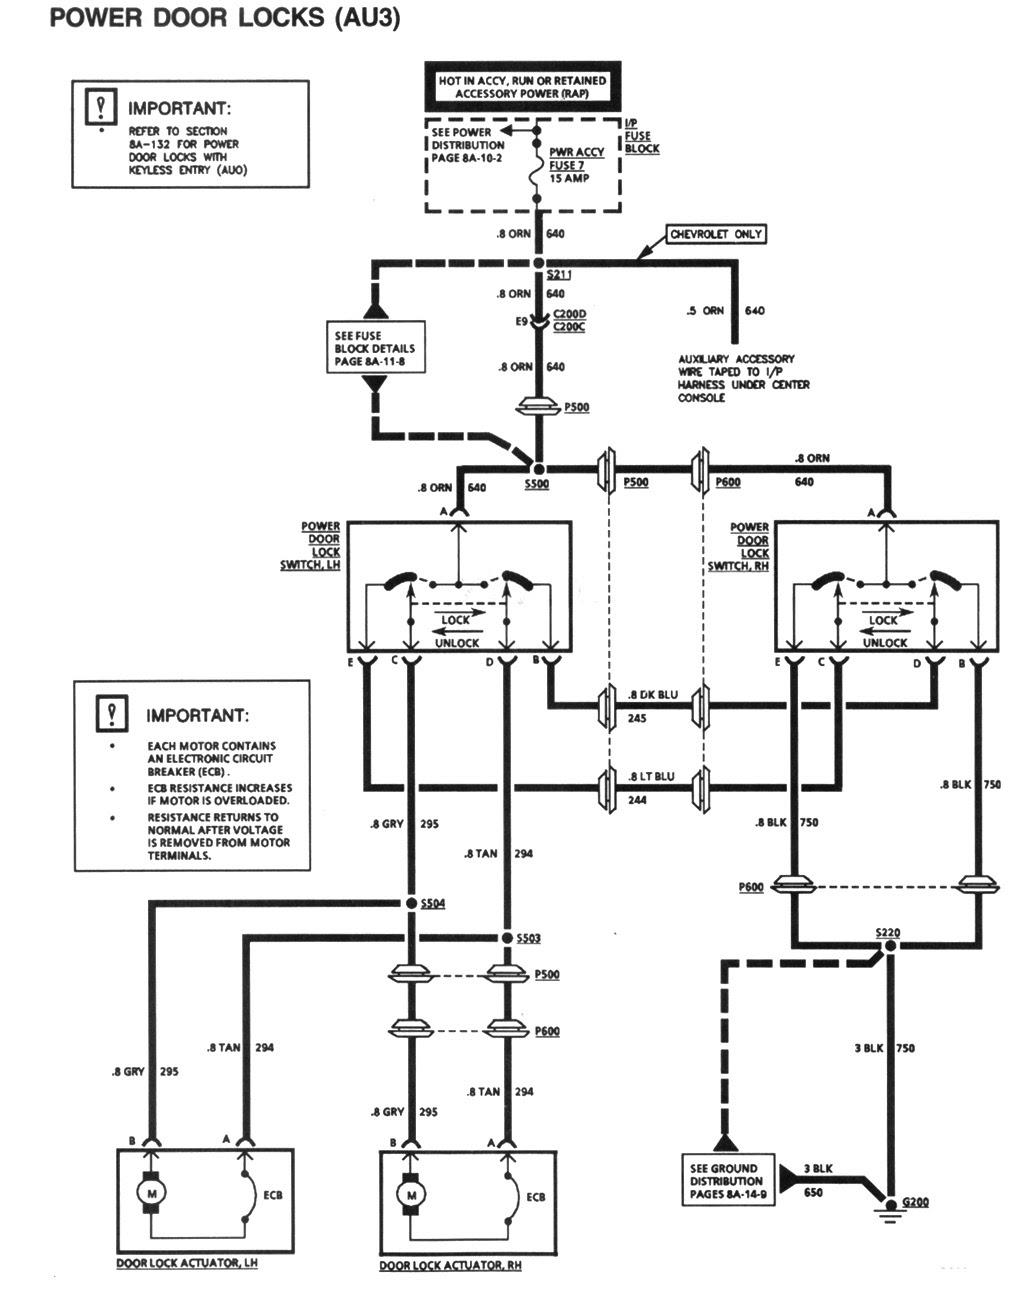 25816 Wiring Diagram 1997 Chevy Camaro Wiring Library